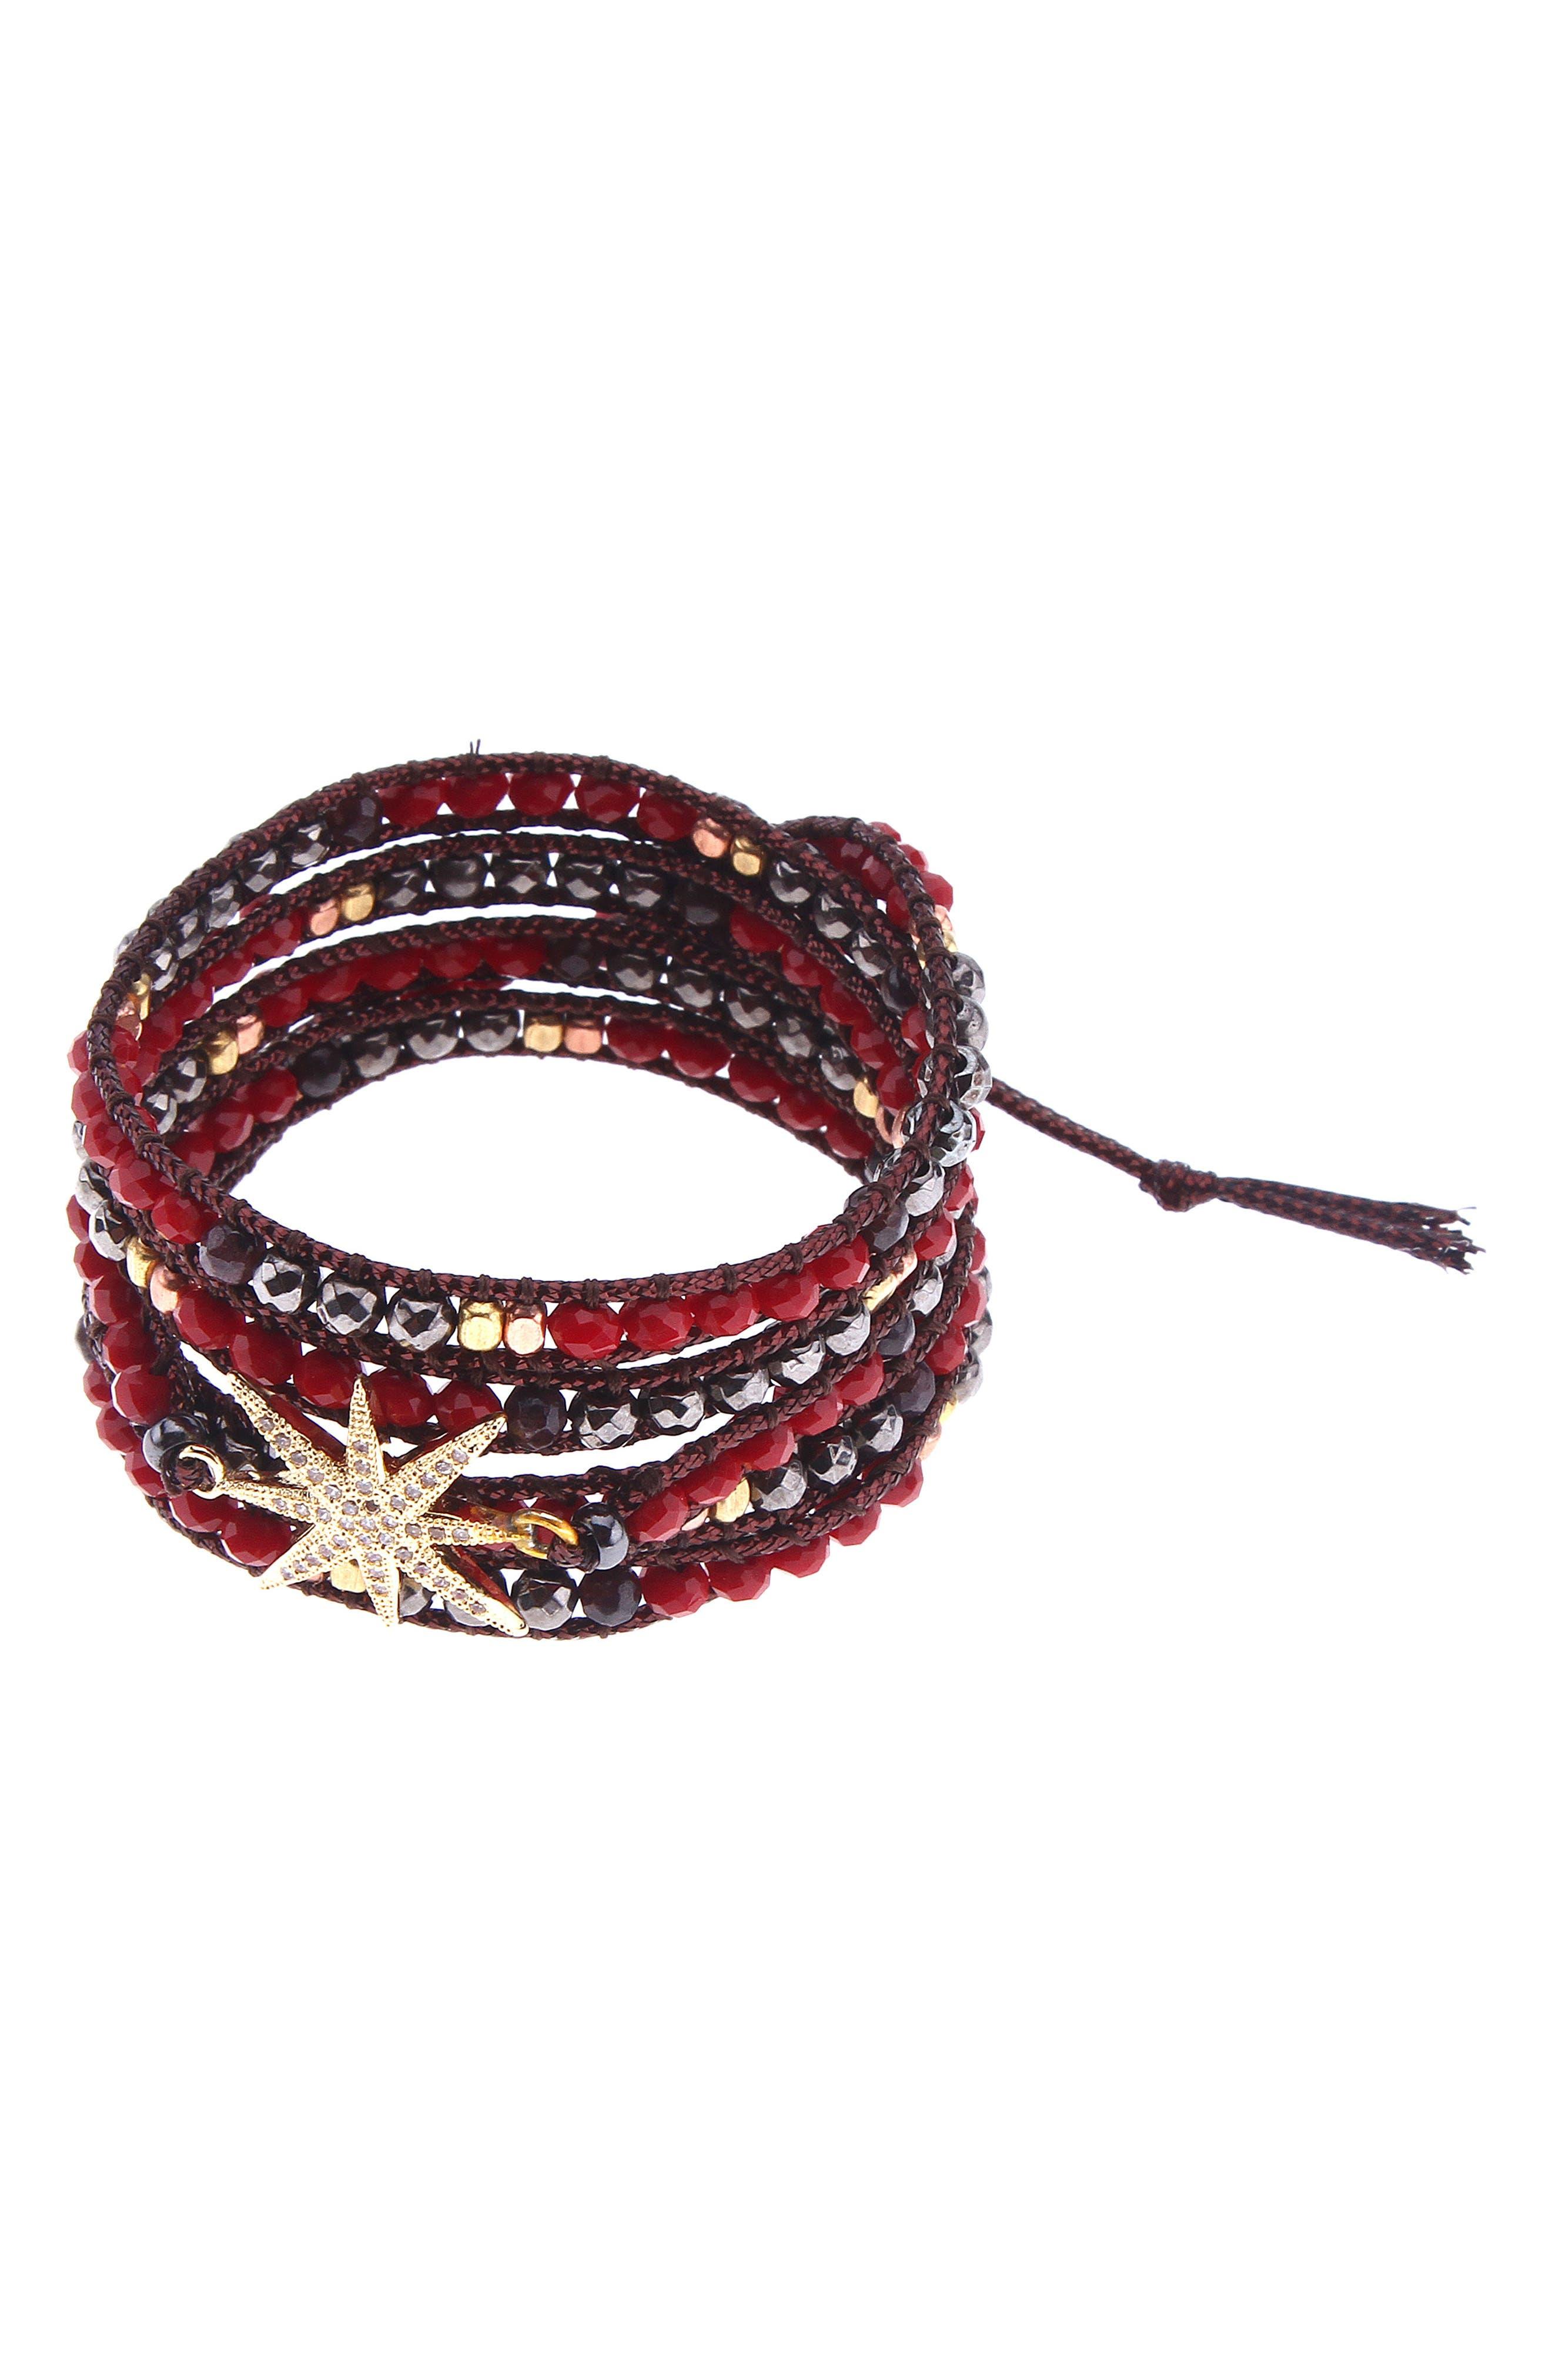 Beaded Leather Wrap Bracelet,                             Main thumbnail 1, color,                             600